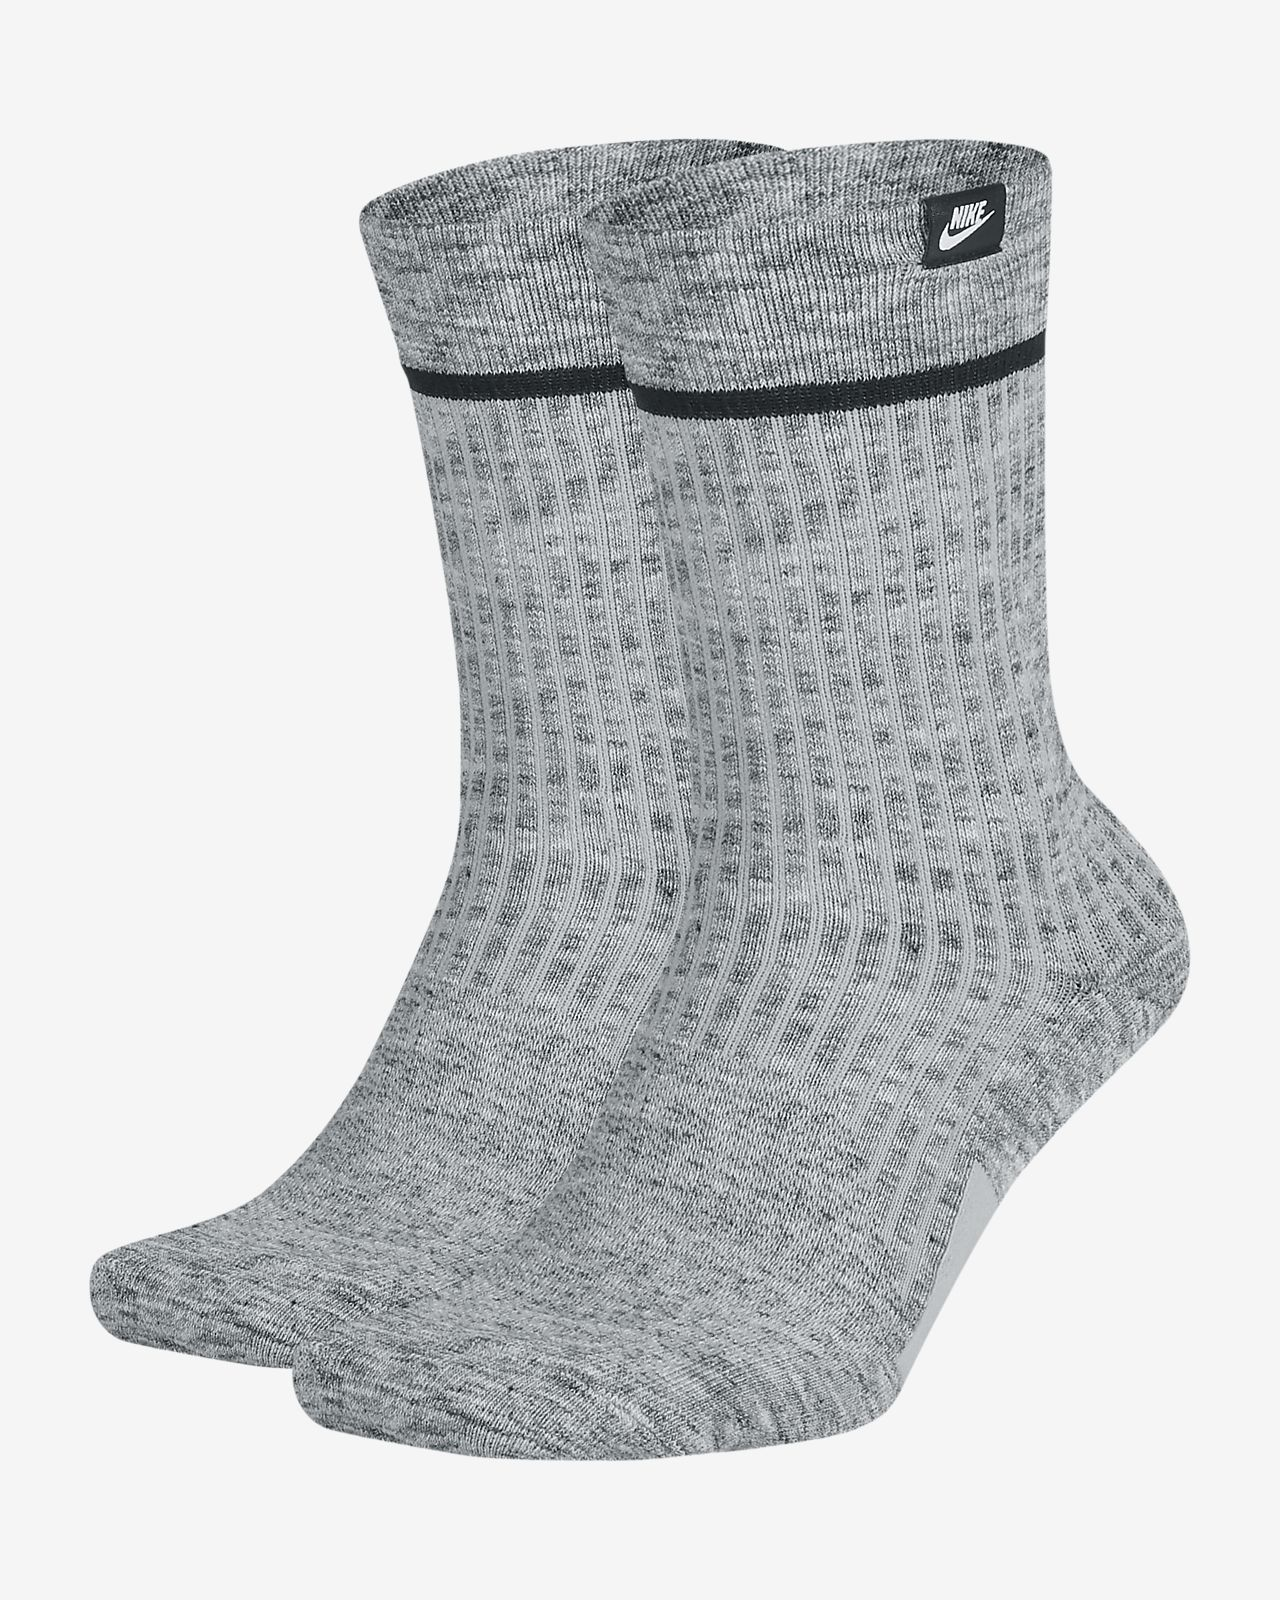 6cd9ece0826 Nike SNKR Sox Essential Crew Socks (2 Pairs). Nike.com